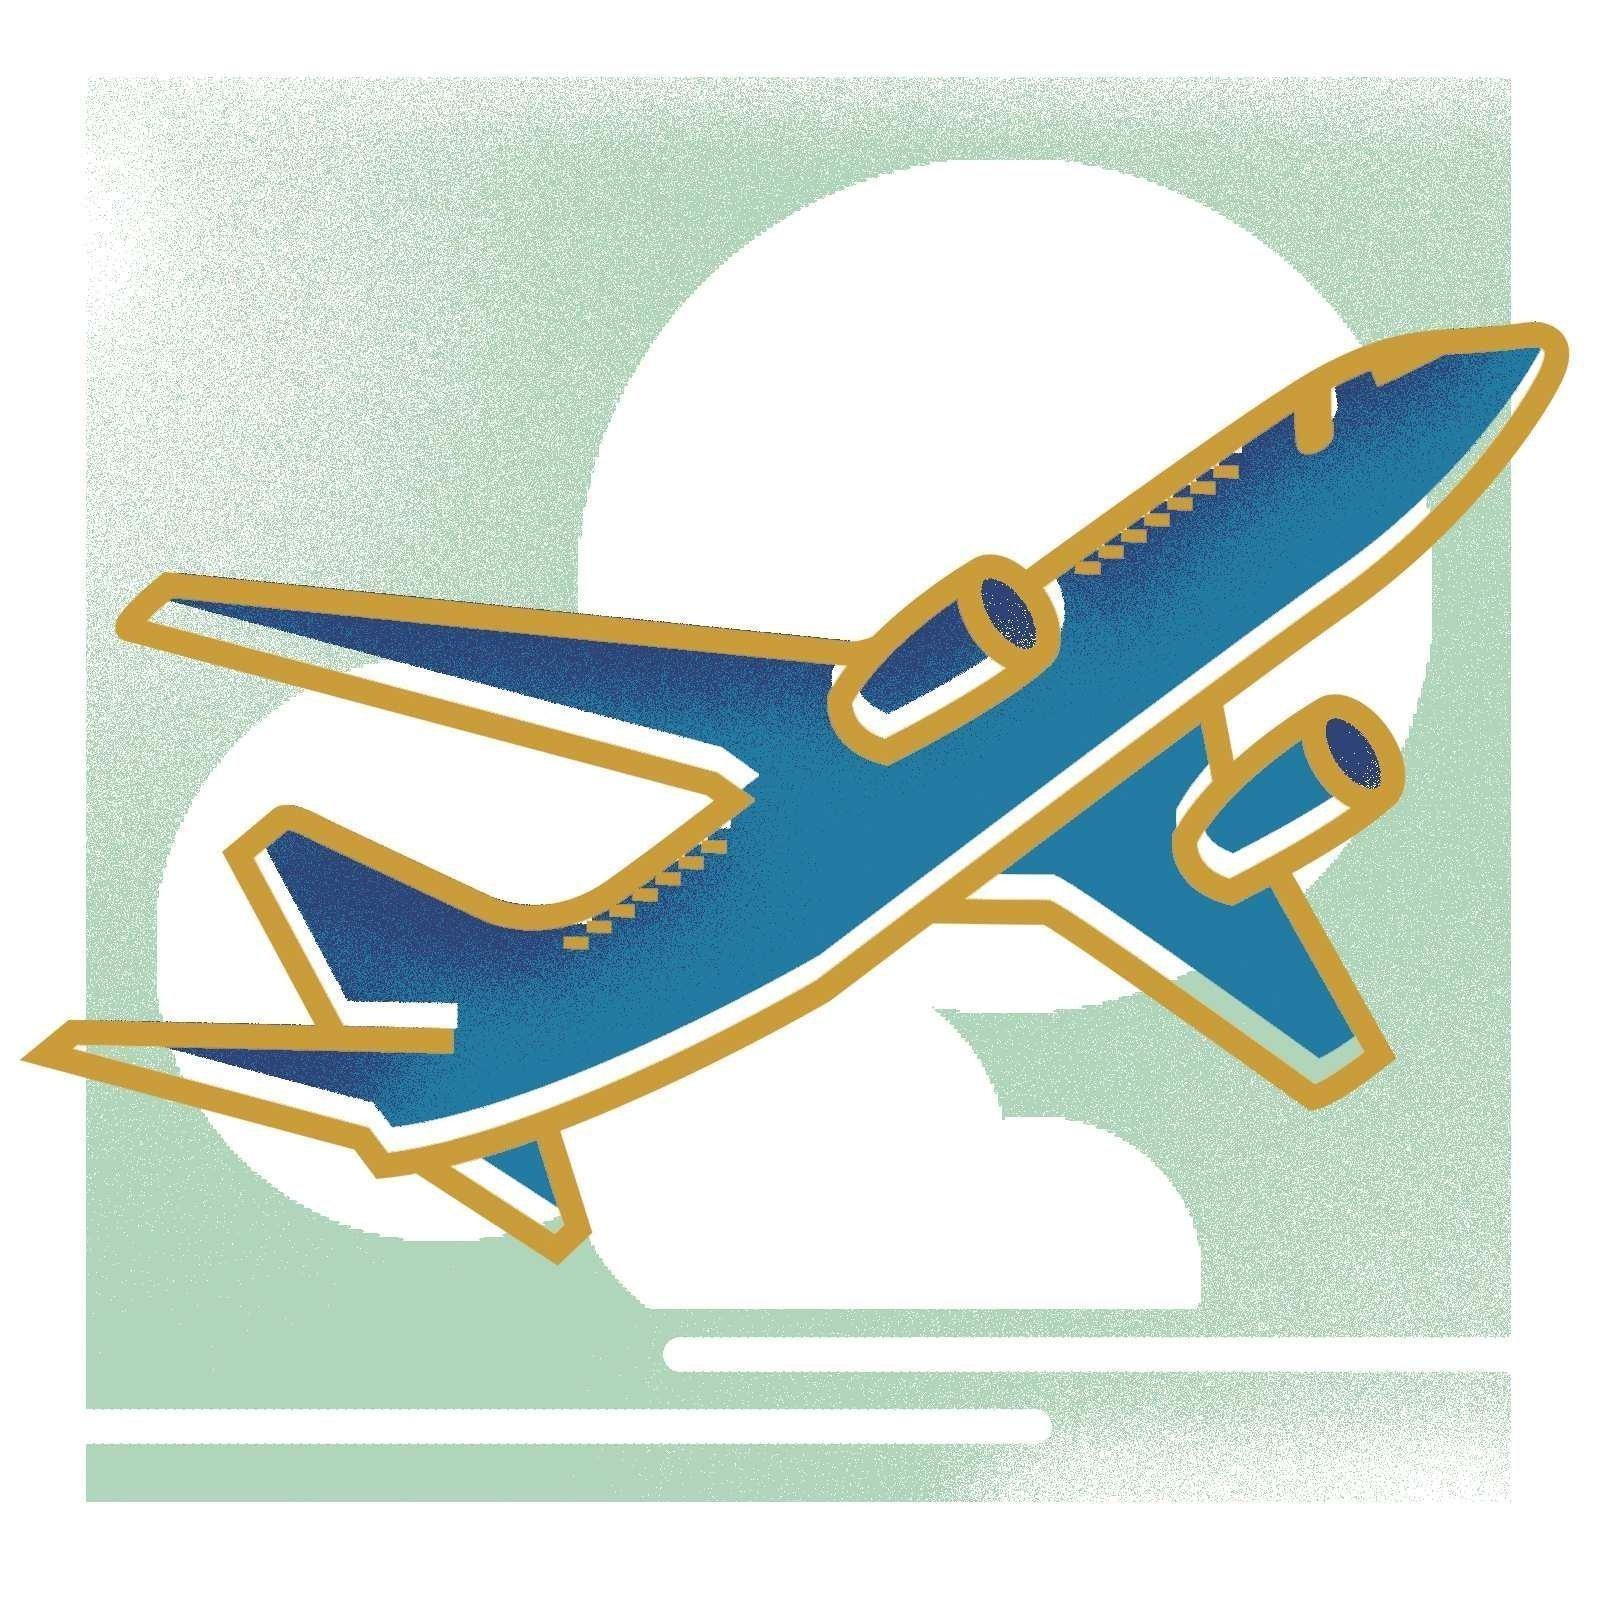 sato travel flights phone numbers